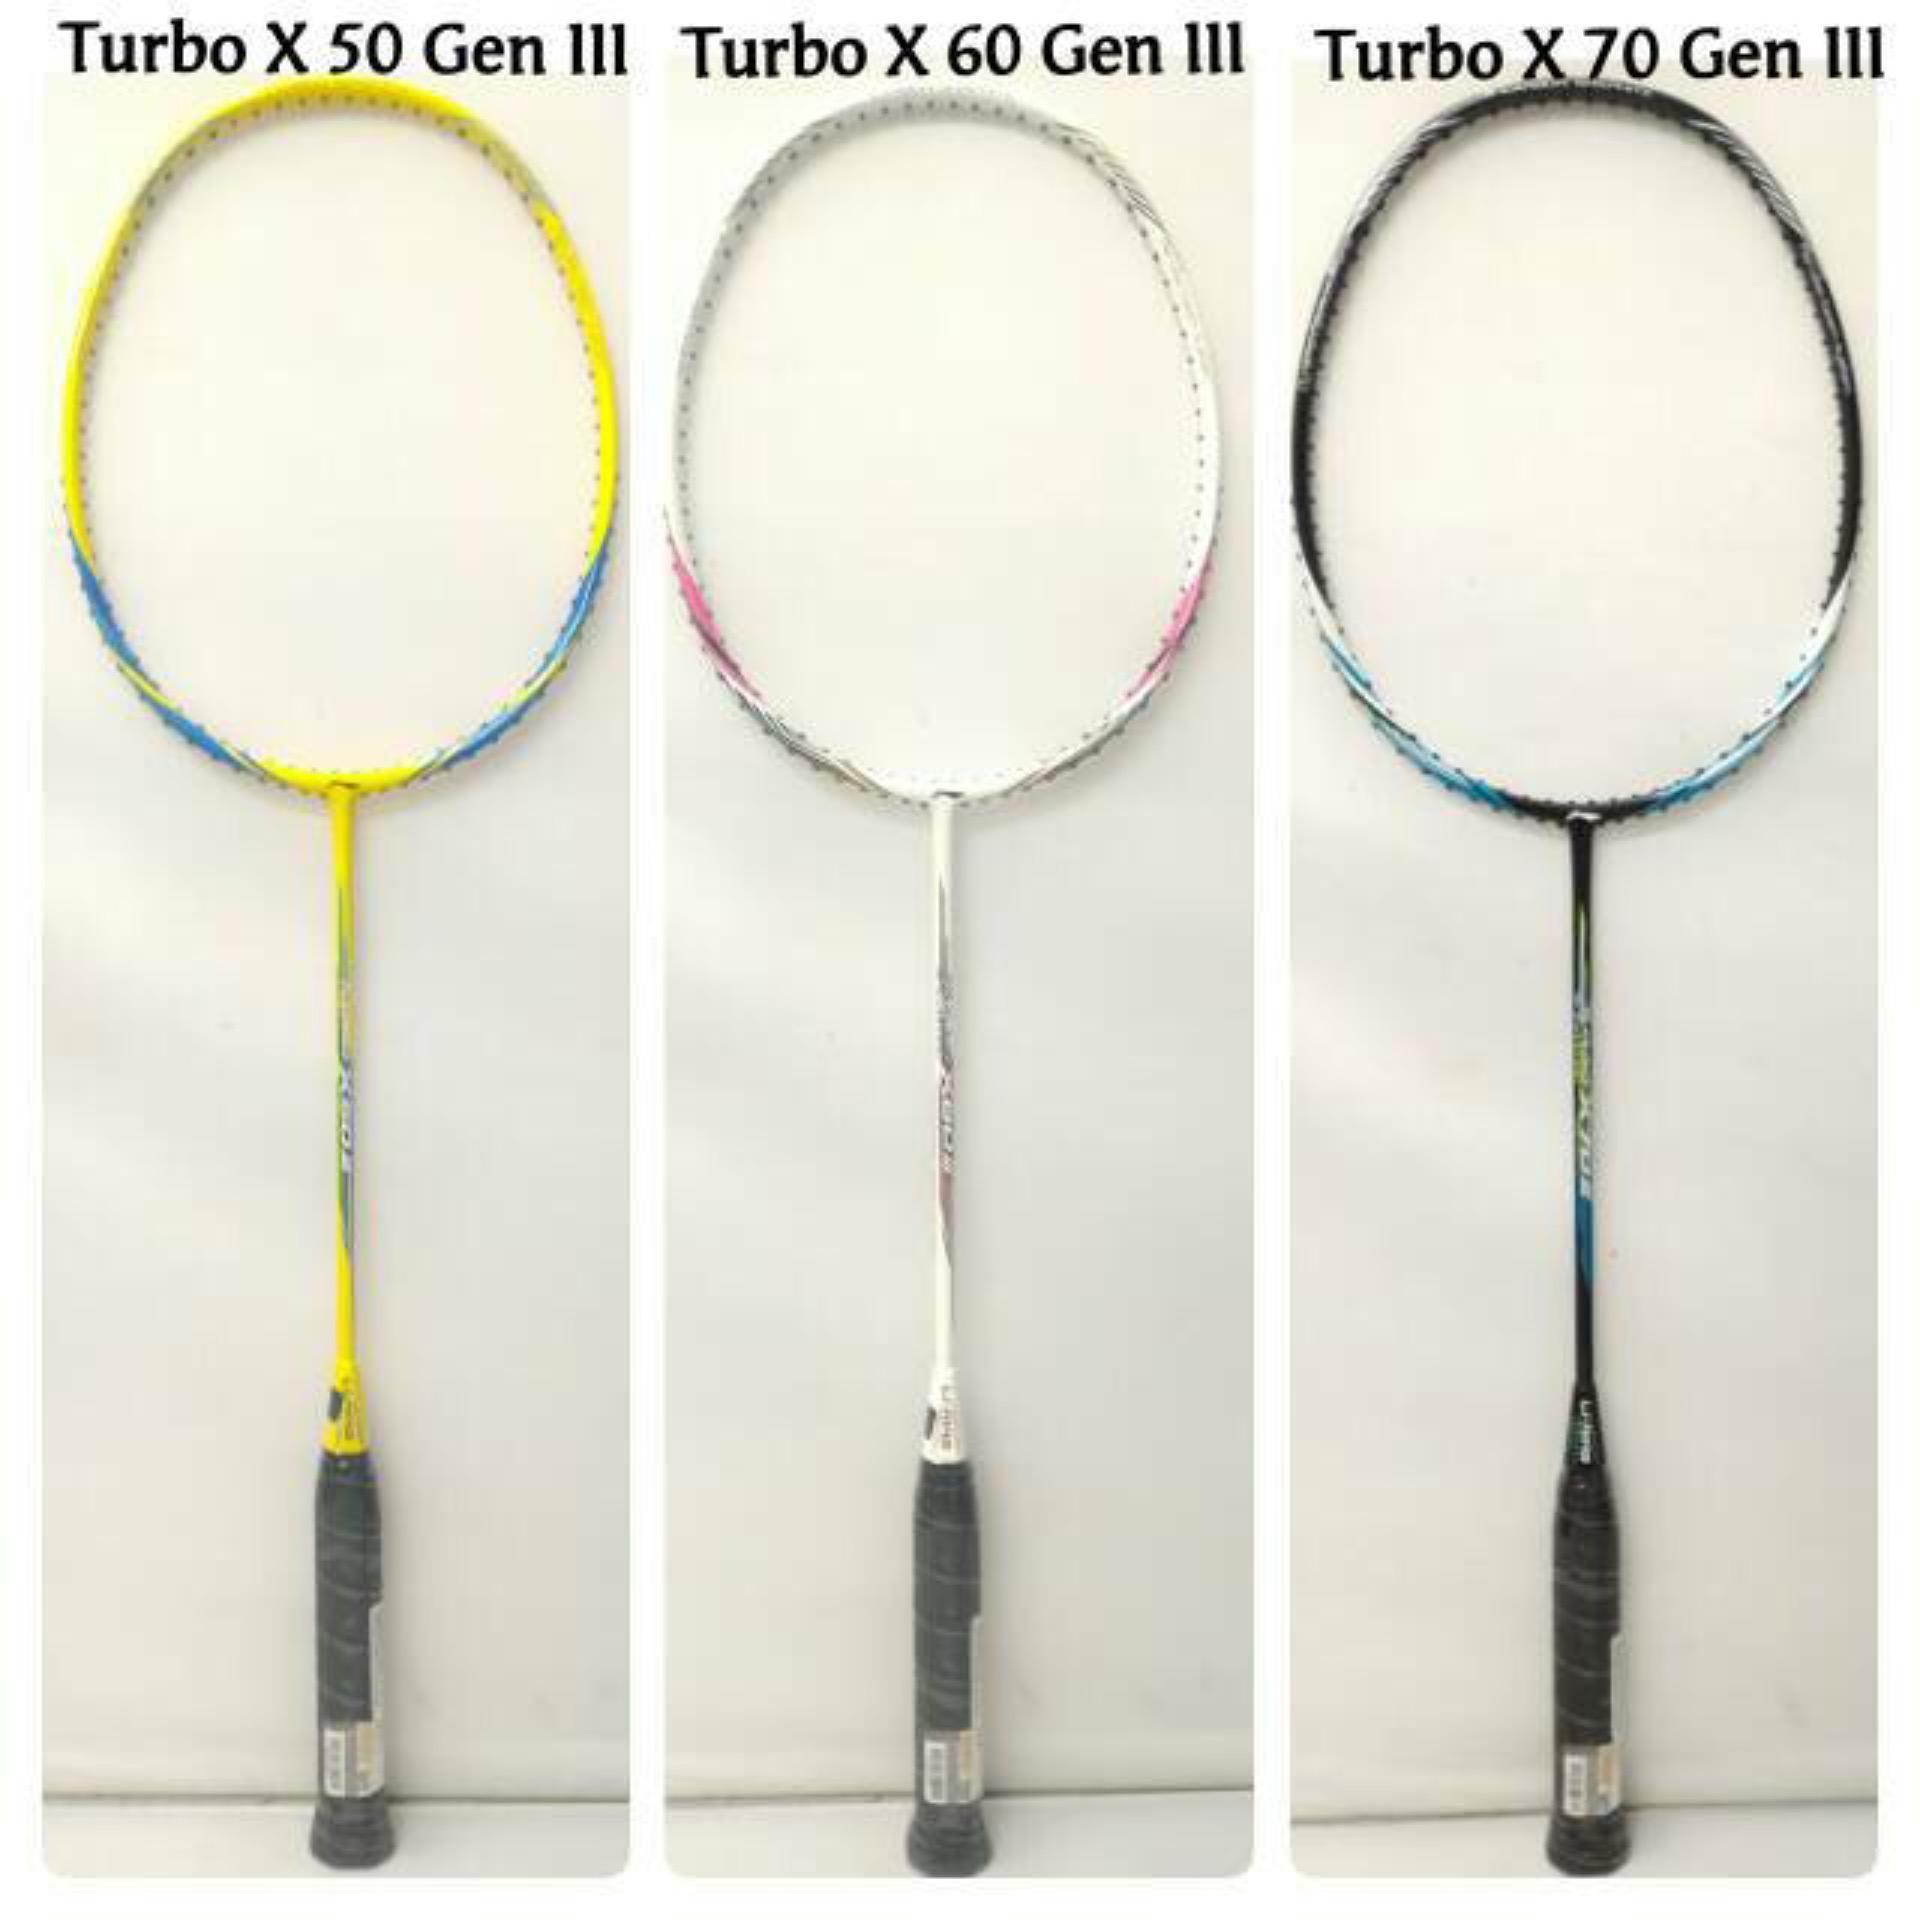 Harga Termurah Raket Badminton Lining Turbo X 70 Generation Iii Yonex  Berkualitas Original